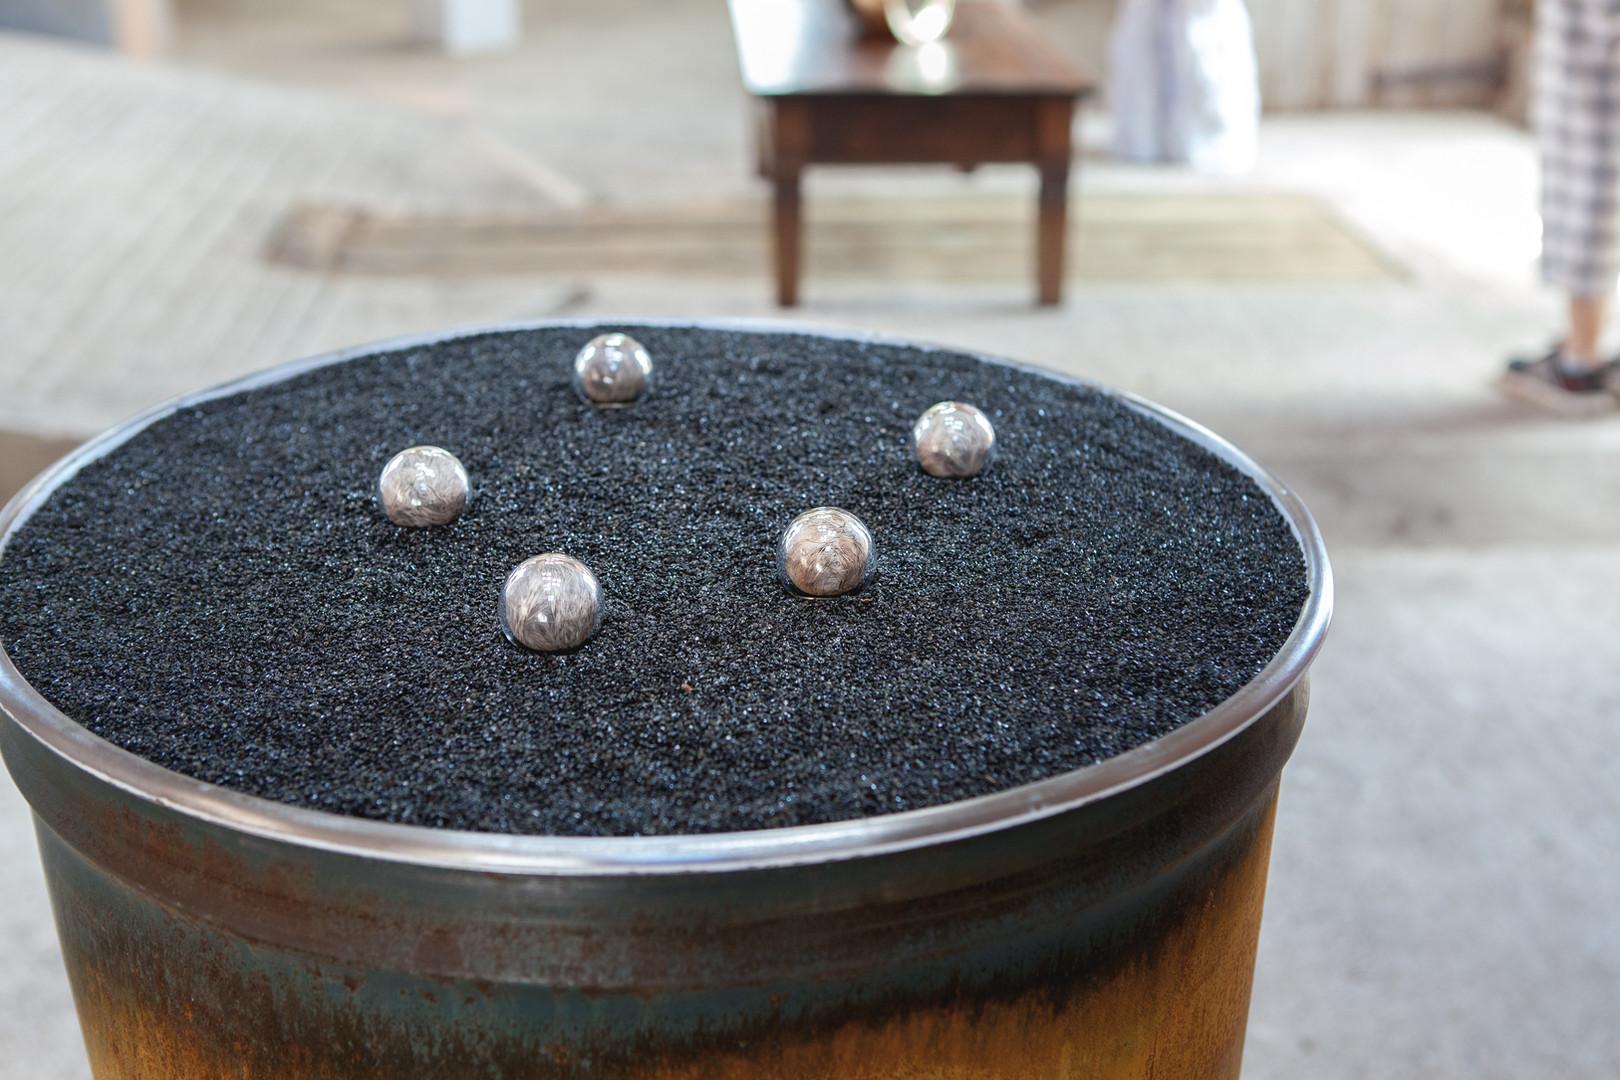 Adeline de Monseignat, Seeds